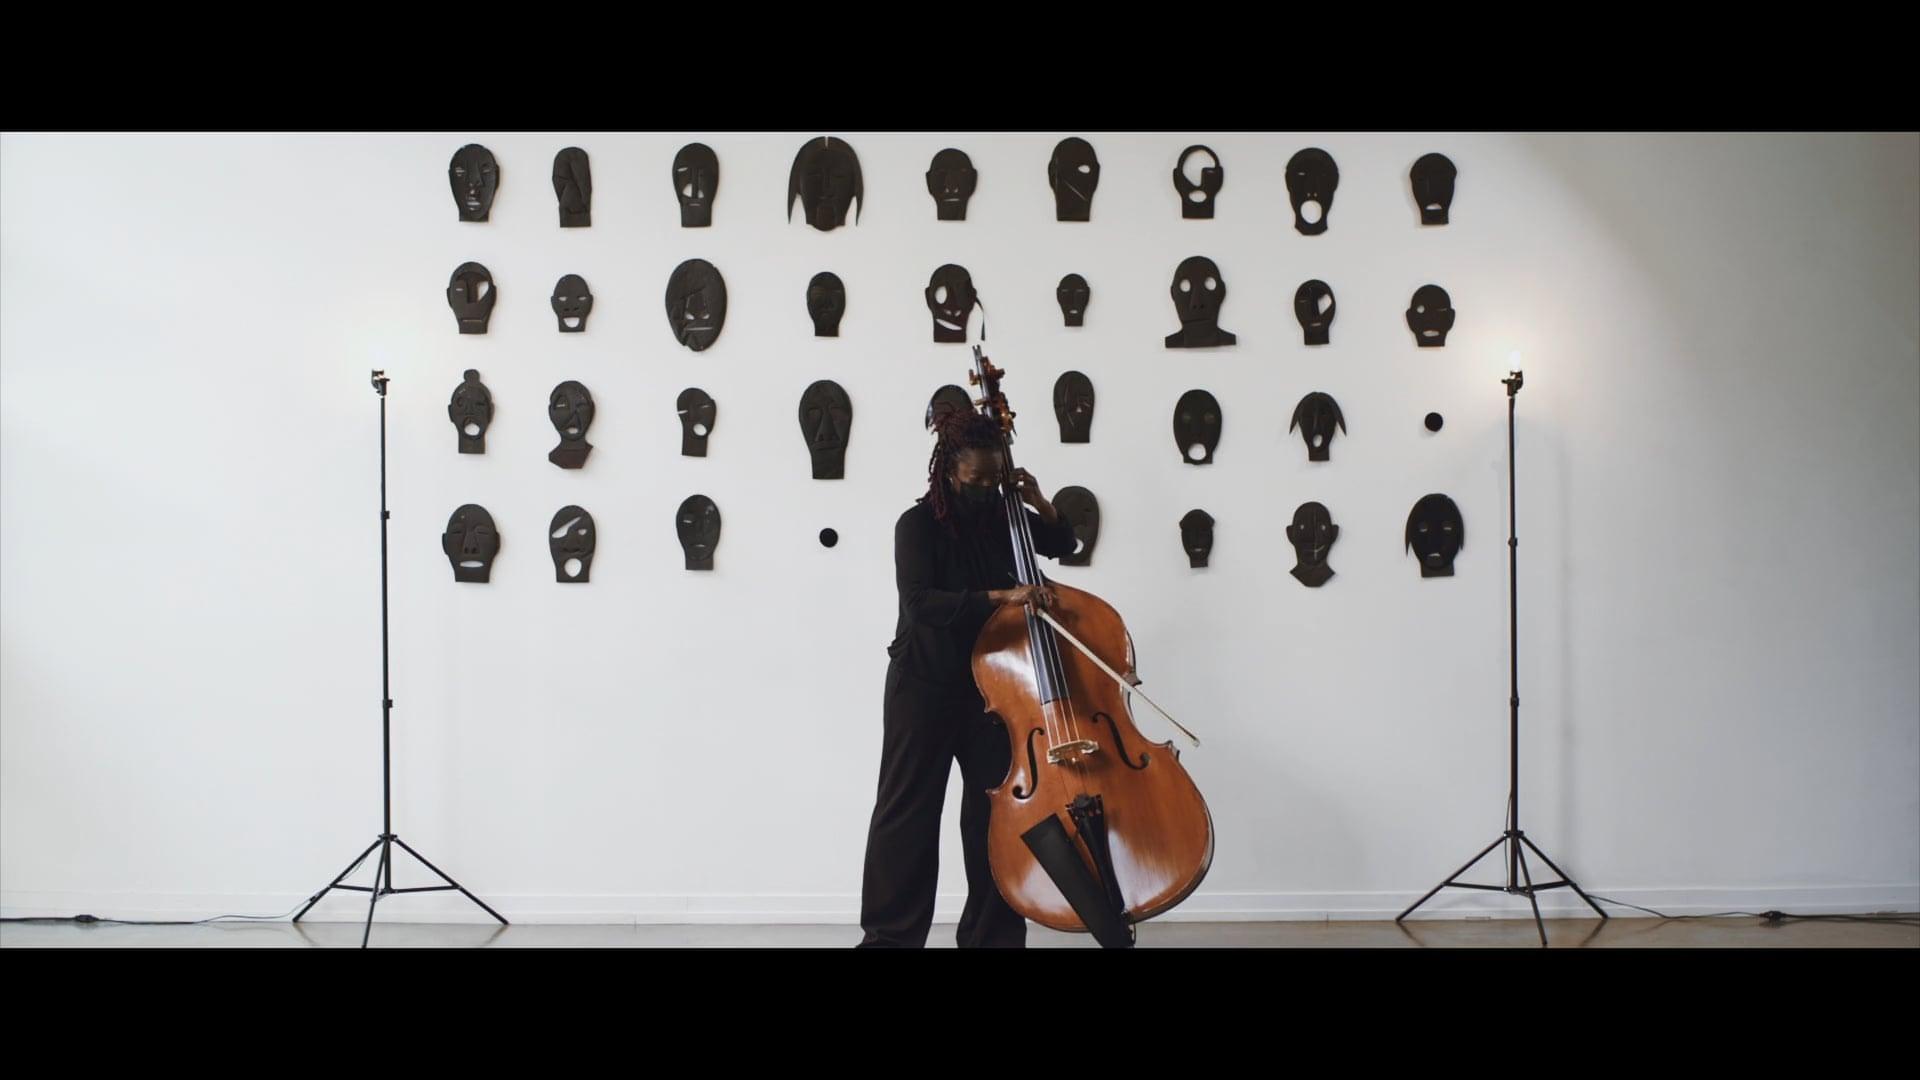 LISTEN PERFORMANCE - Wu Fei PIRATE & THE OKRA BOAT